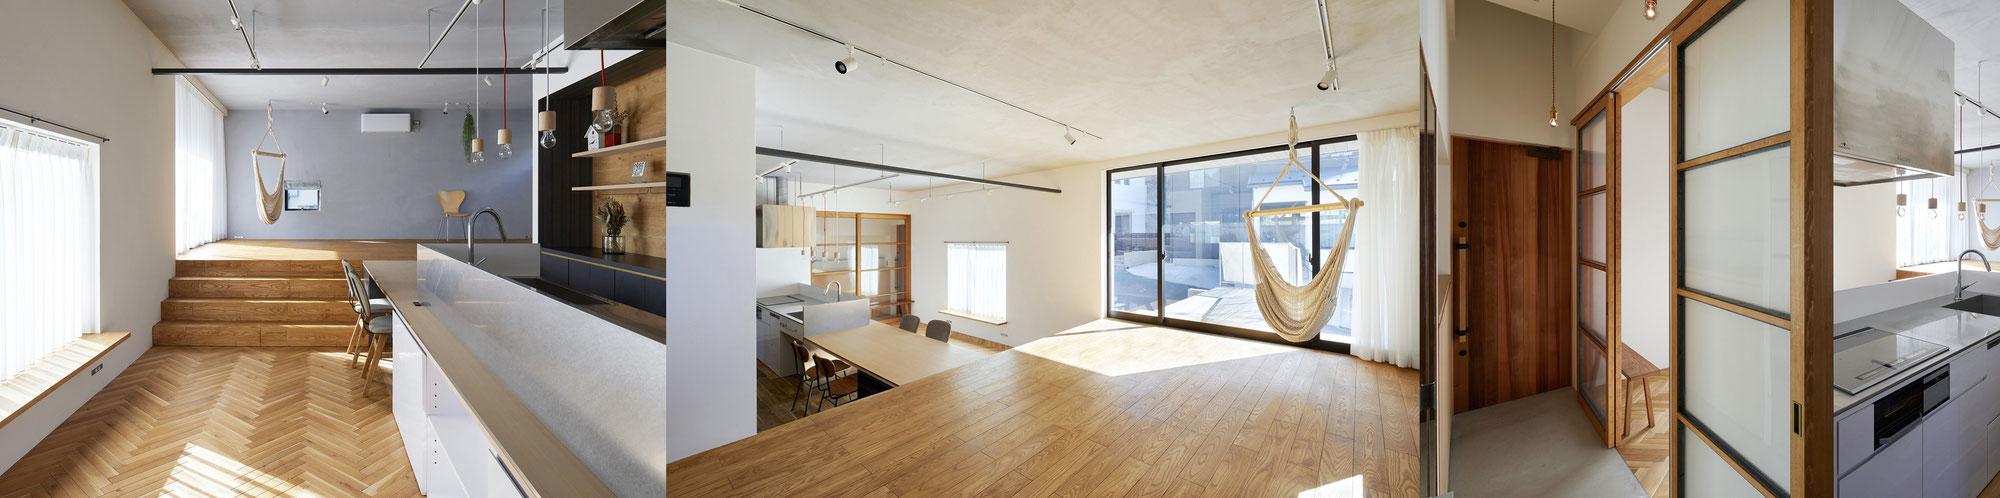 House in Horikoshiのこだわり【床について】